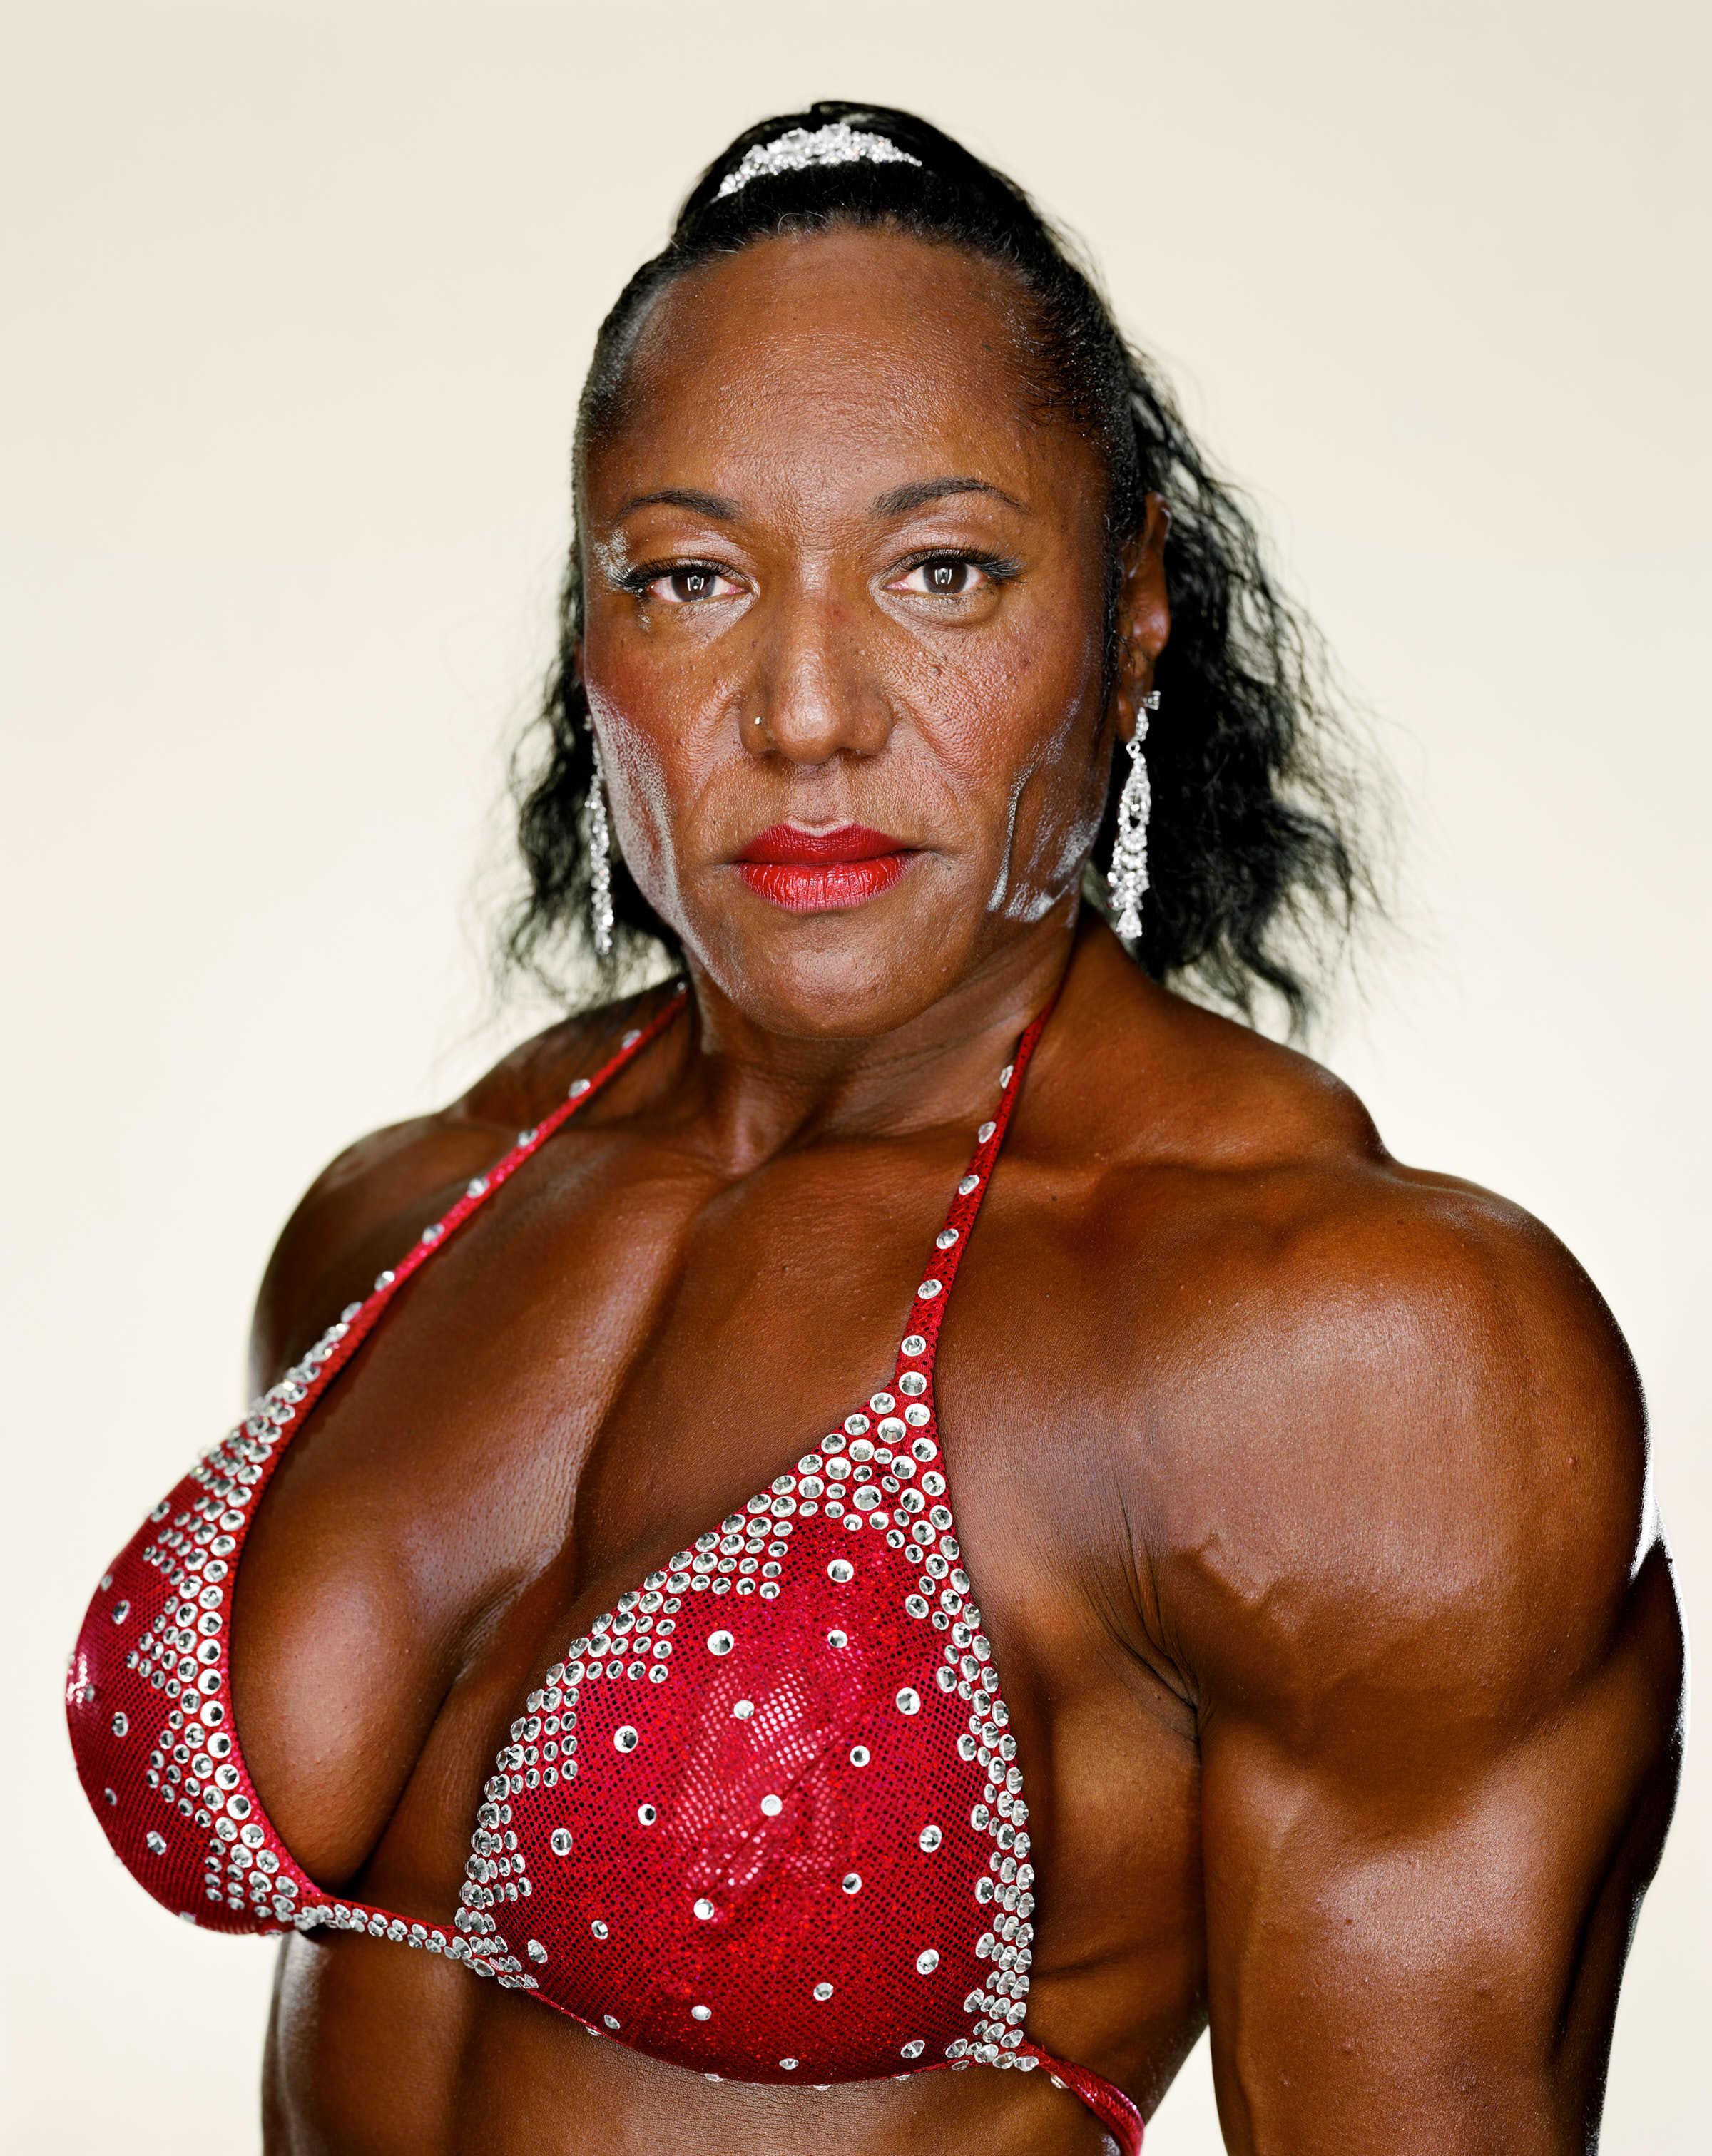 Martin Schoeller: Female Bodybuilders: Carmella Cureton, 2007 © Martin Schoeller